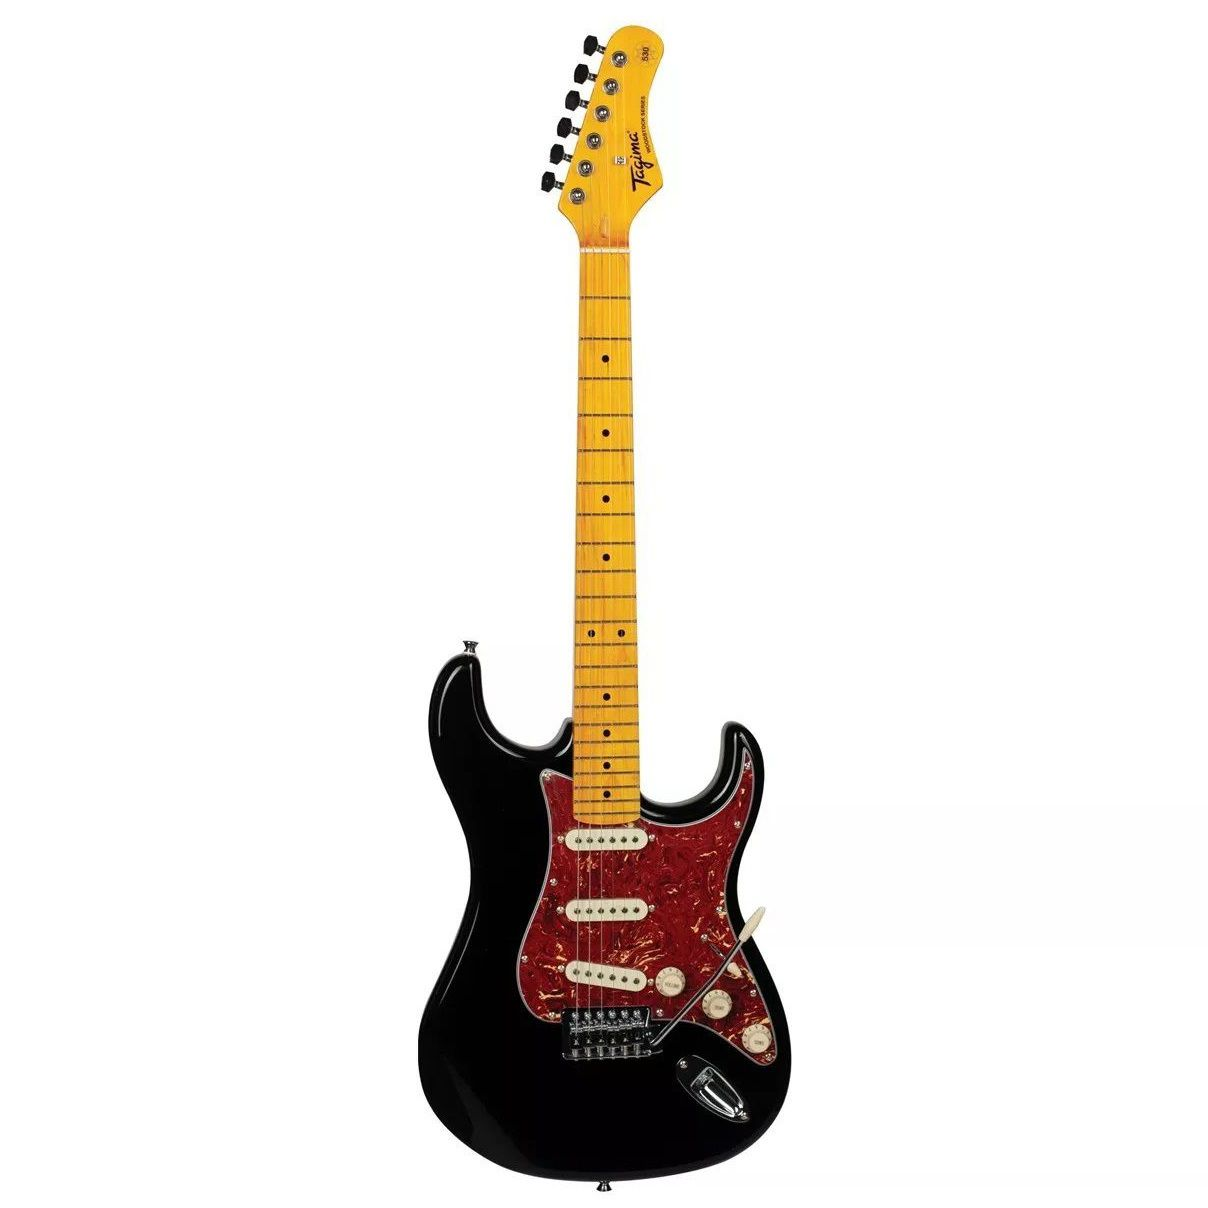 Guitarra Tagima Stratocaster Woodstock Tg530 Bk Preto